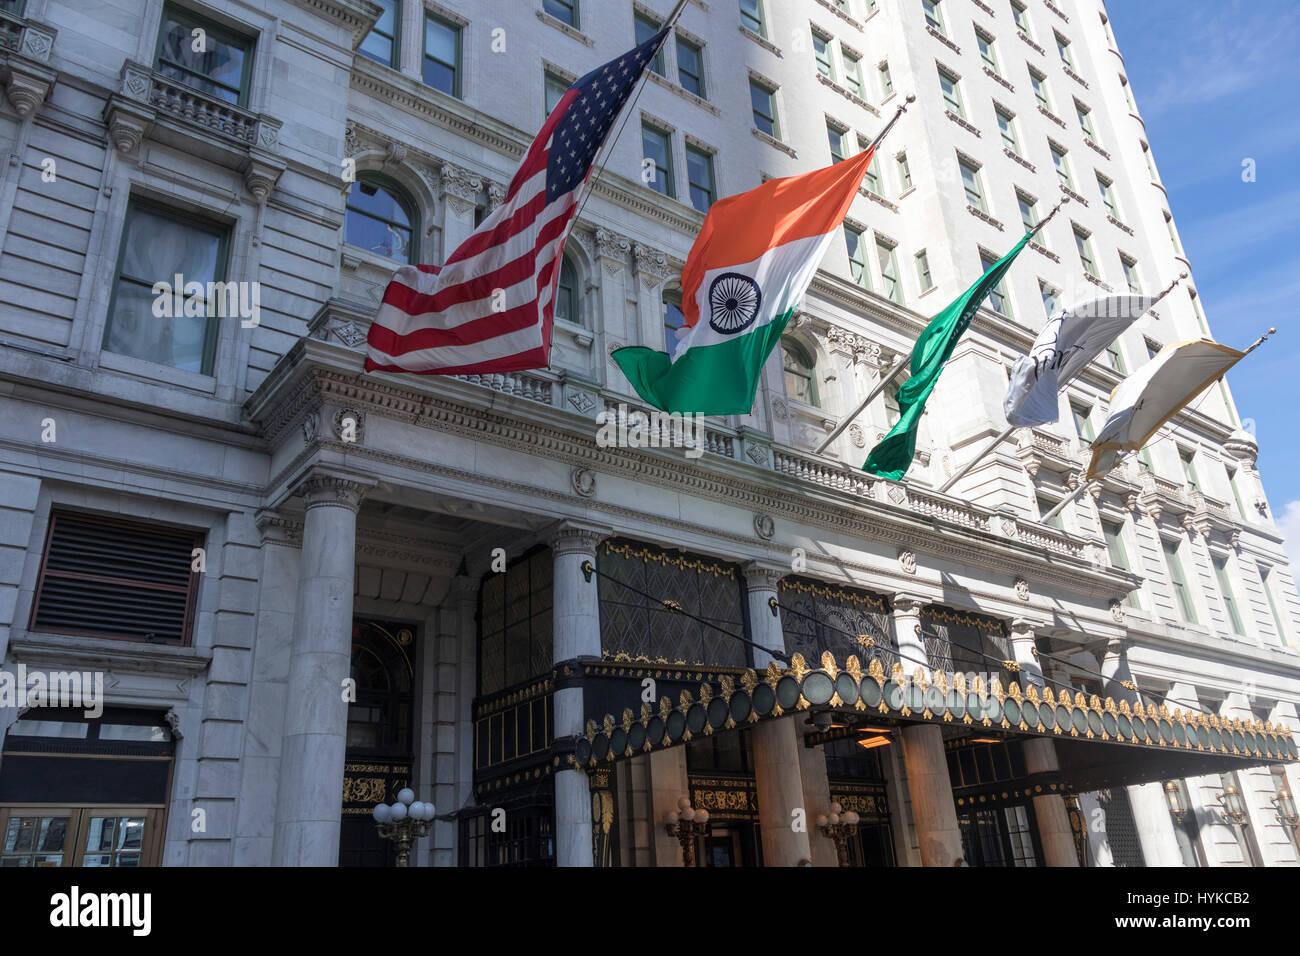 Entrée privée, l'hôtel Plaza, Manhattan, New York City Photo Stock